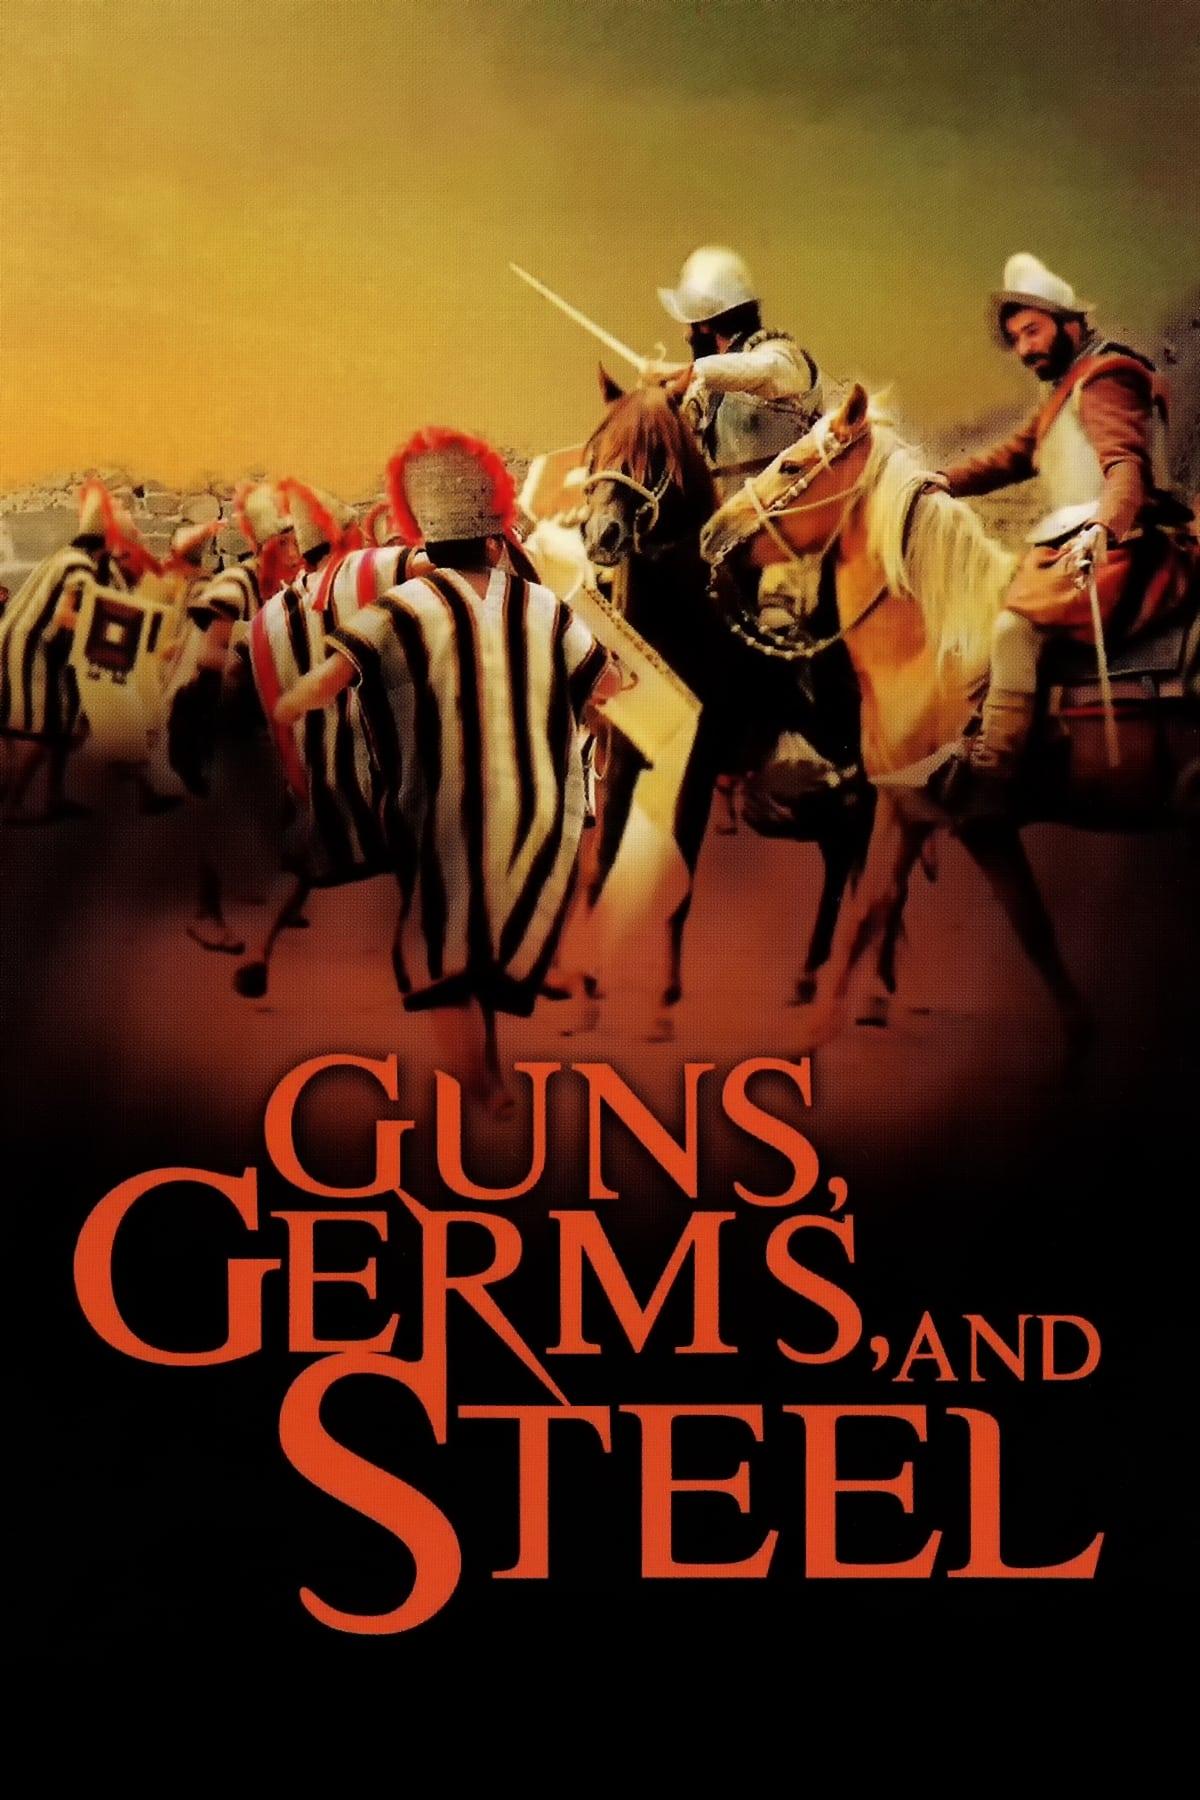 Guns Germs & Steel (2005)